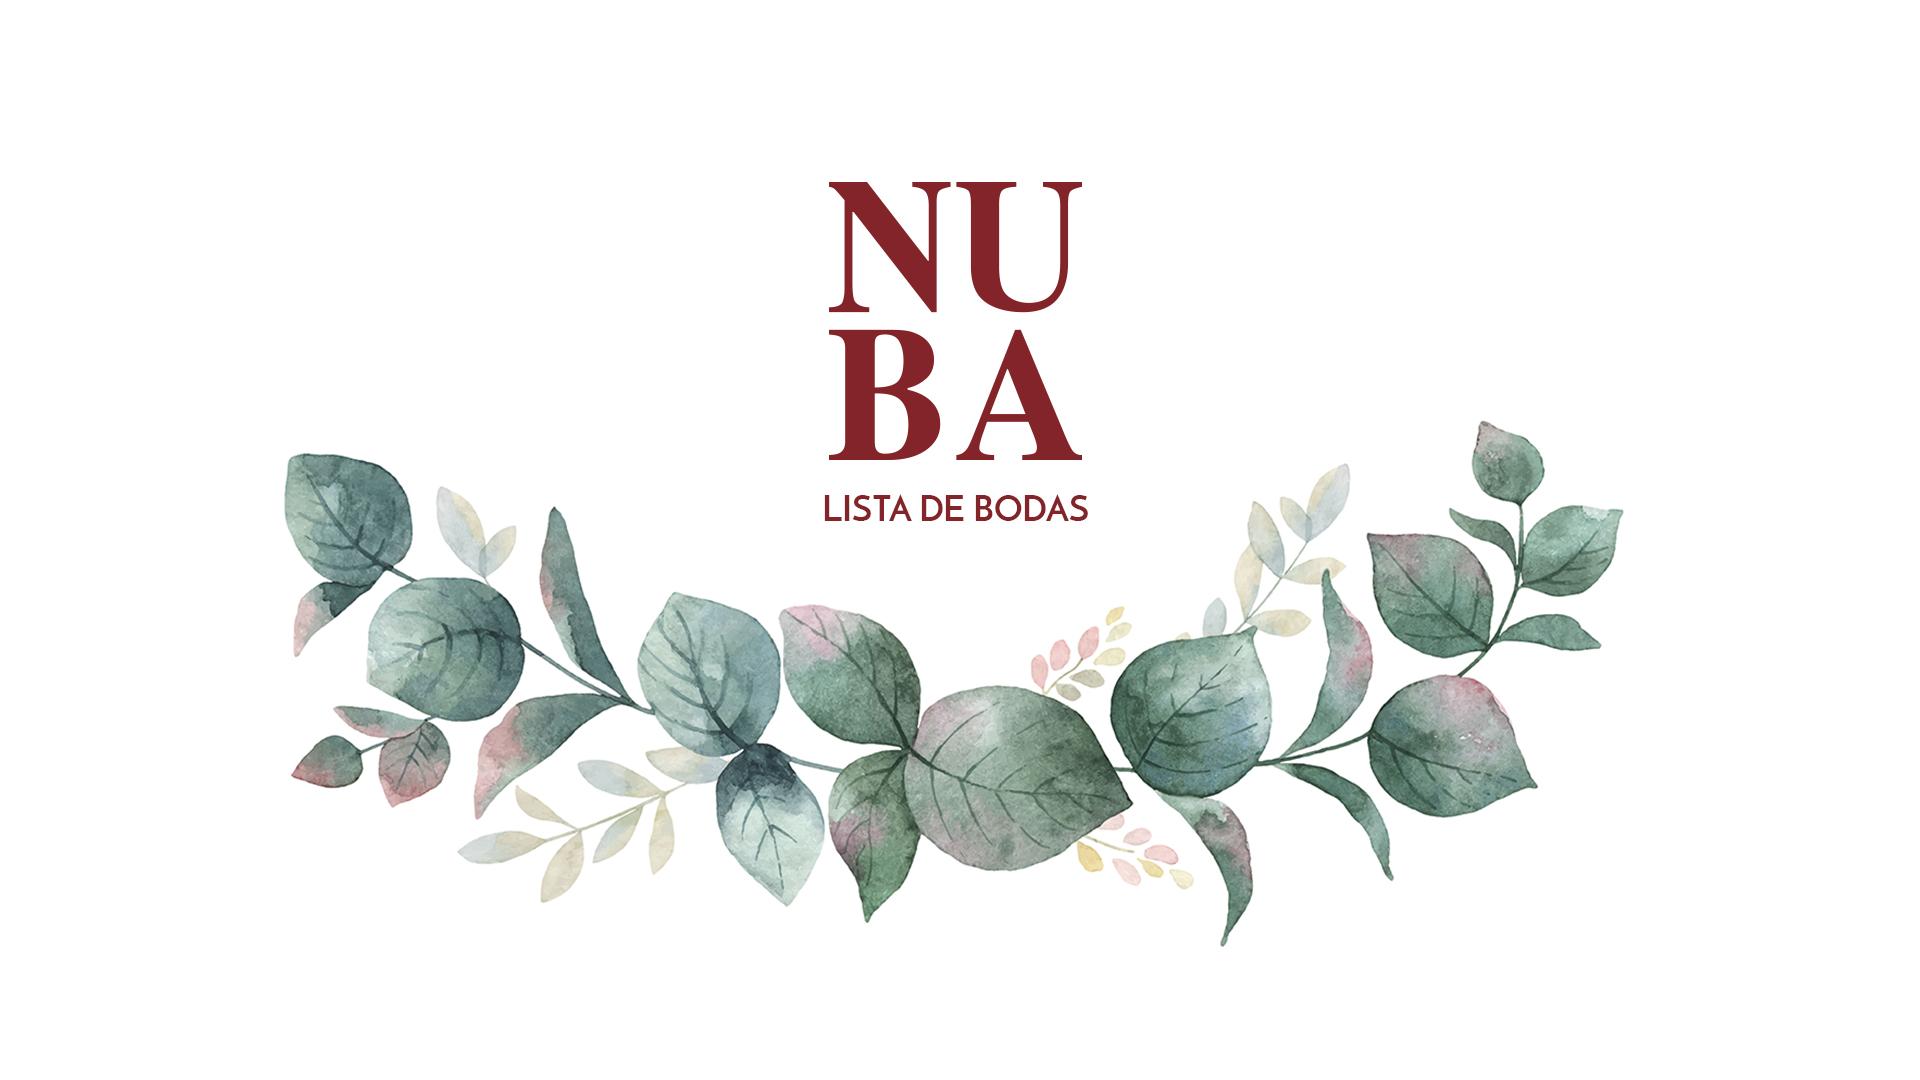 NUBA, Lista de Bodas OnLine